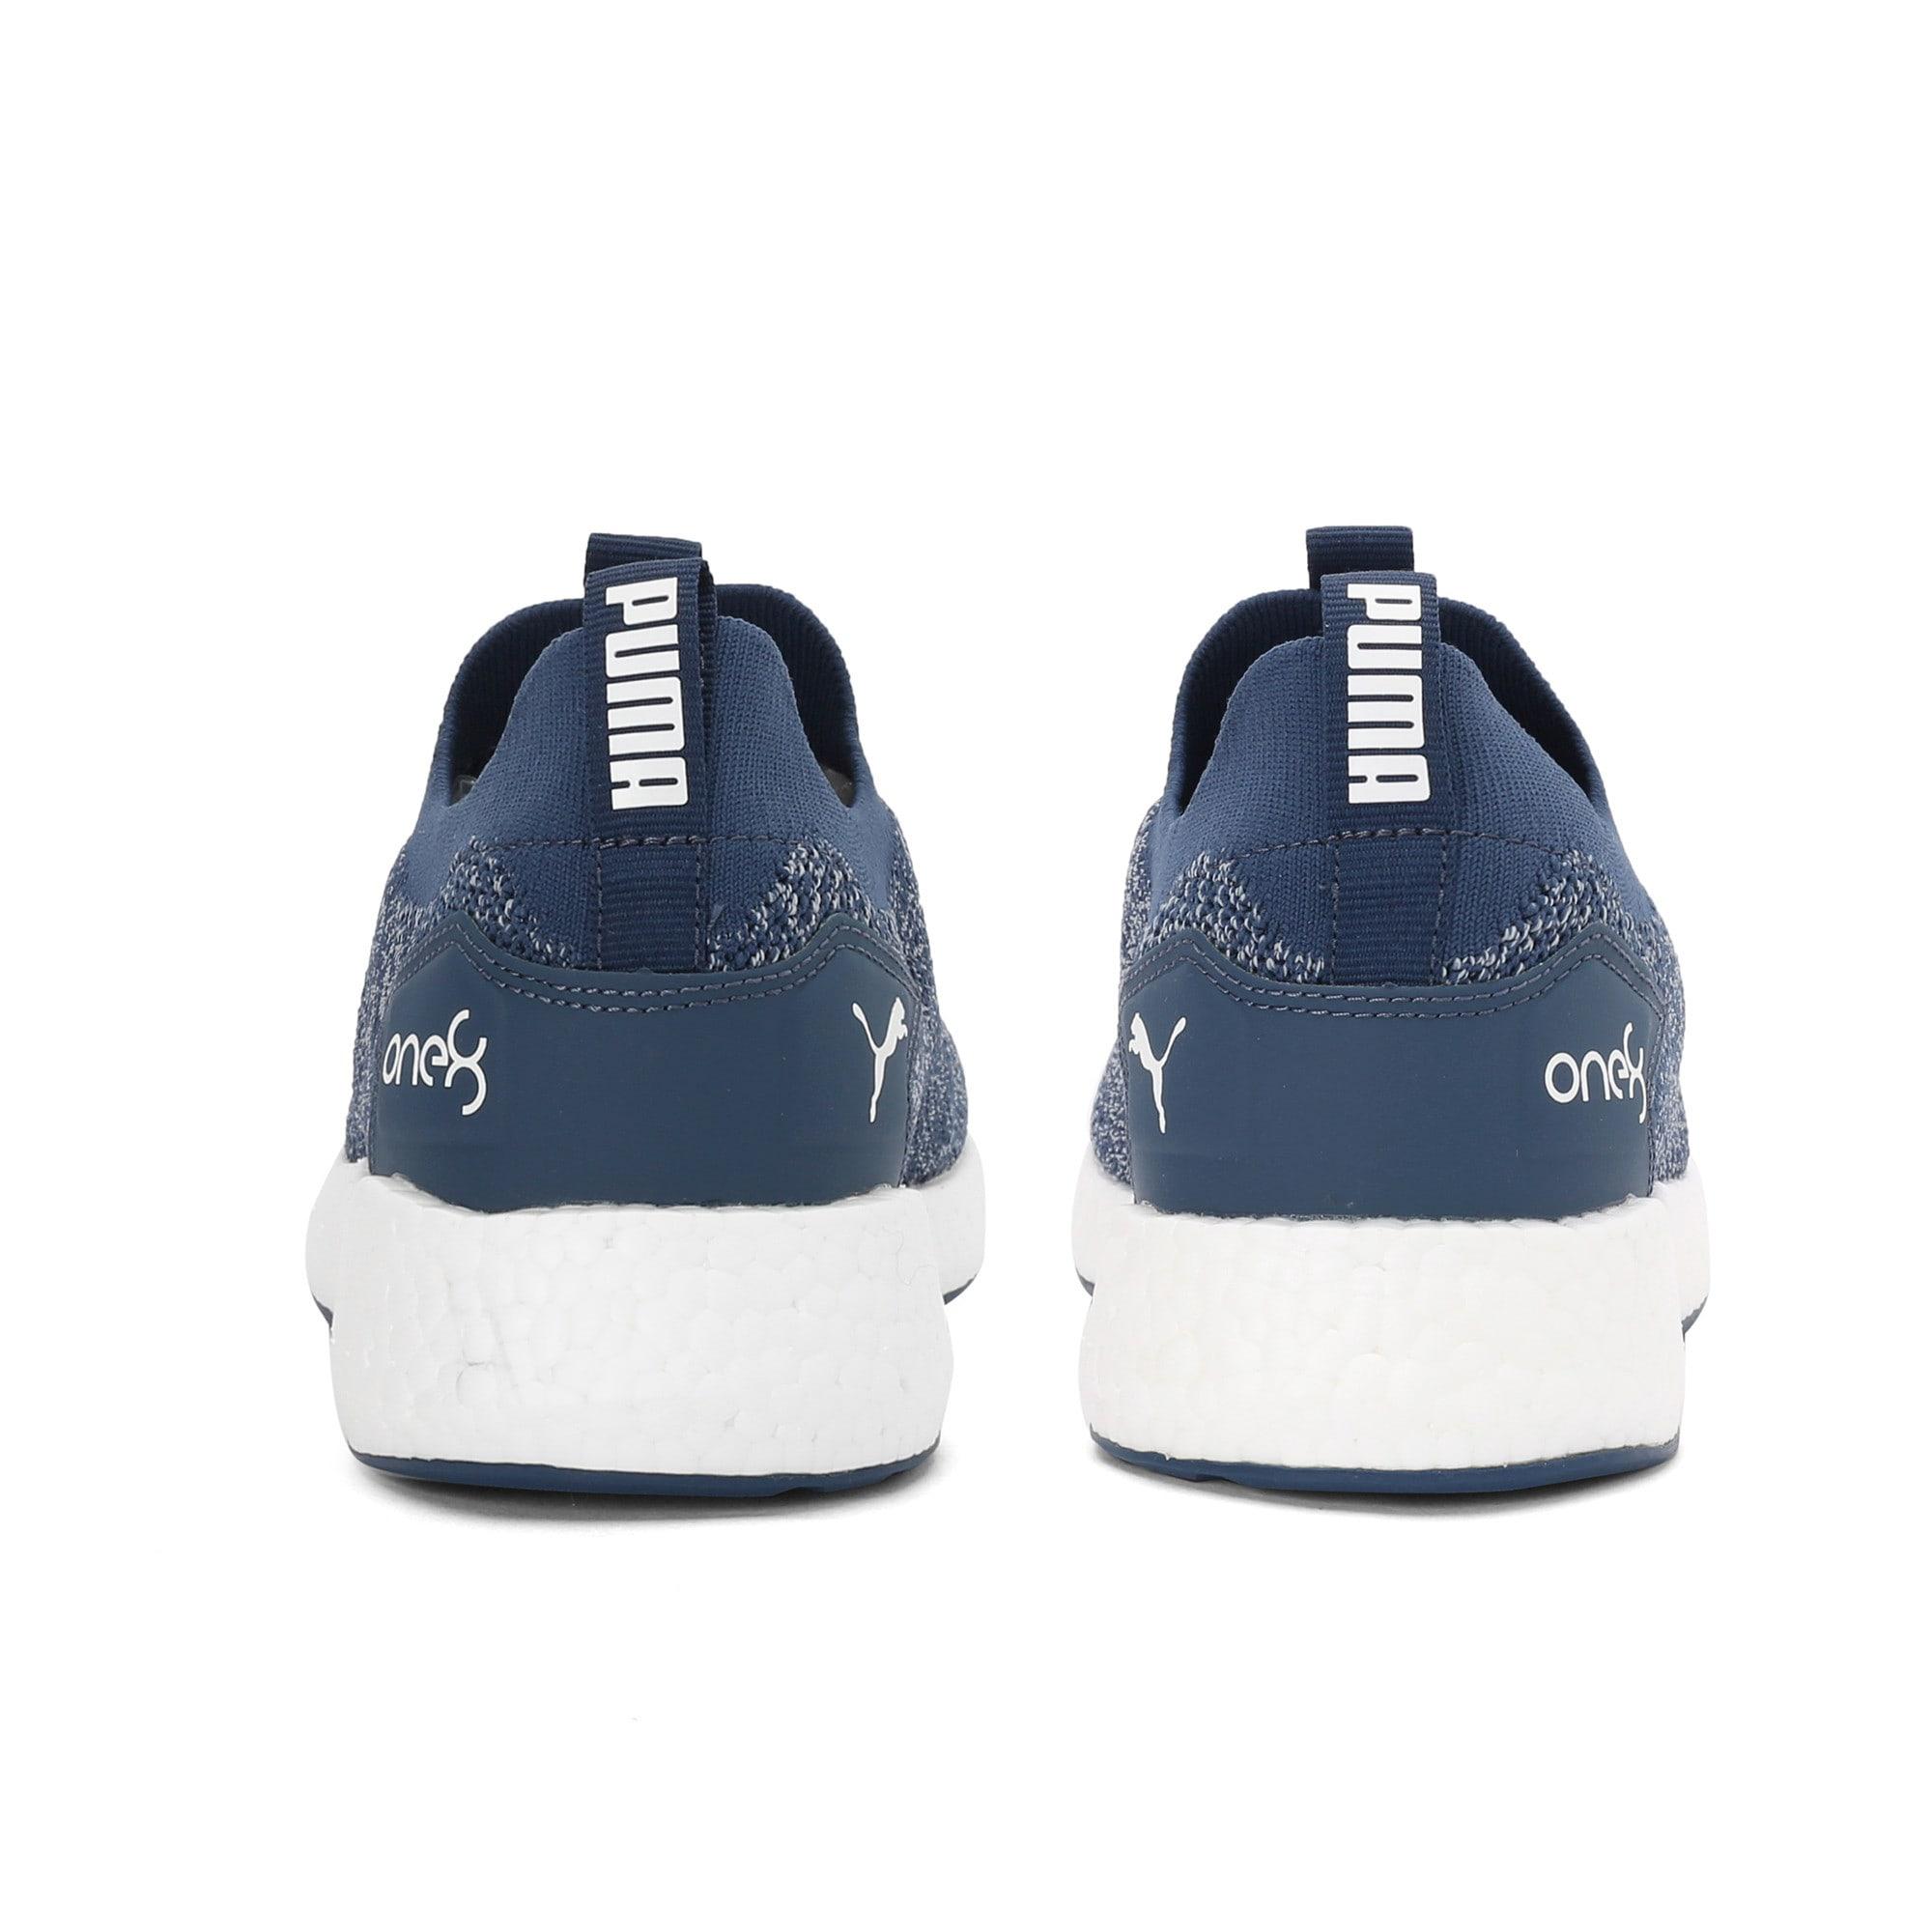 Thumbnail 3 of NRGY Neko Slip-On one8 Unisex Running Shoes, Dark Denim-Puma White, medium-IND